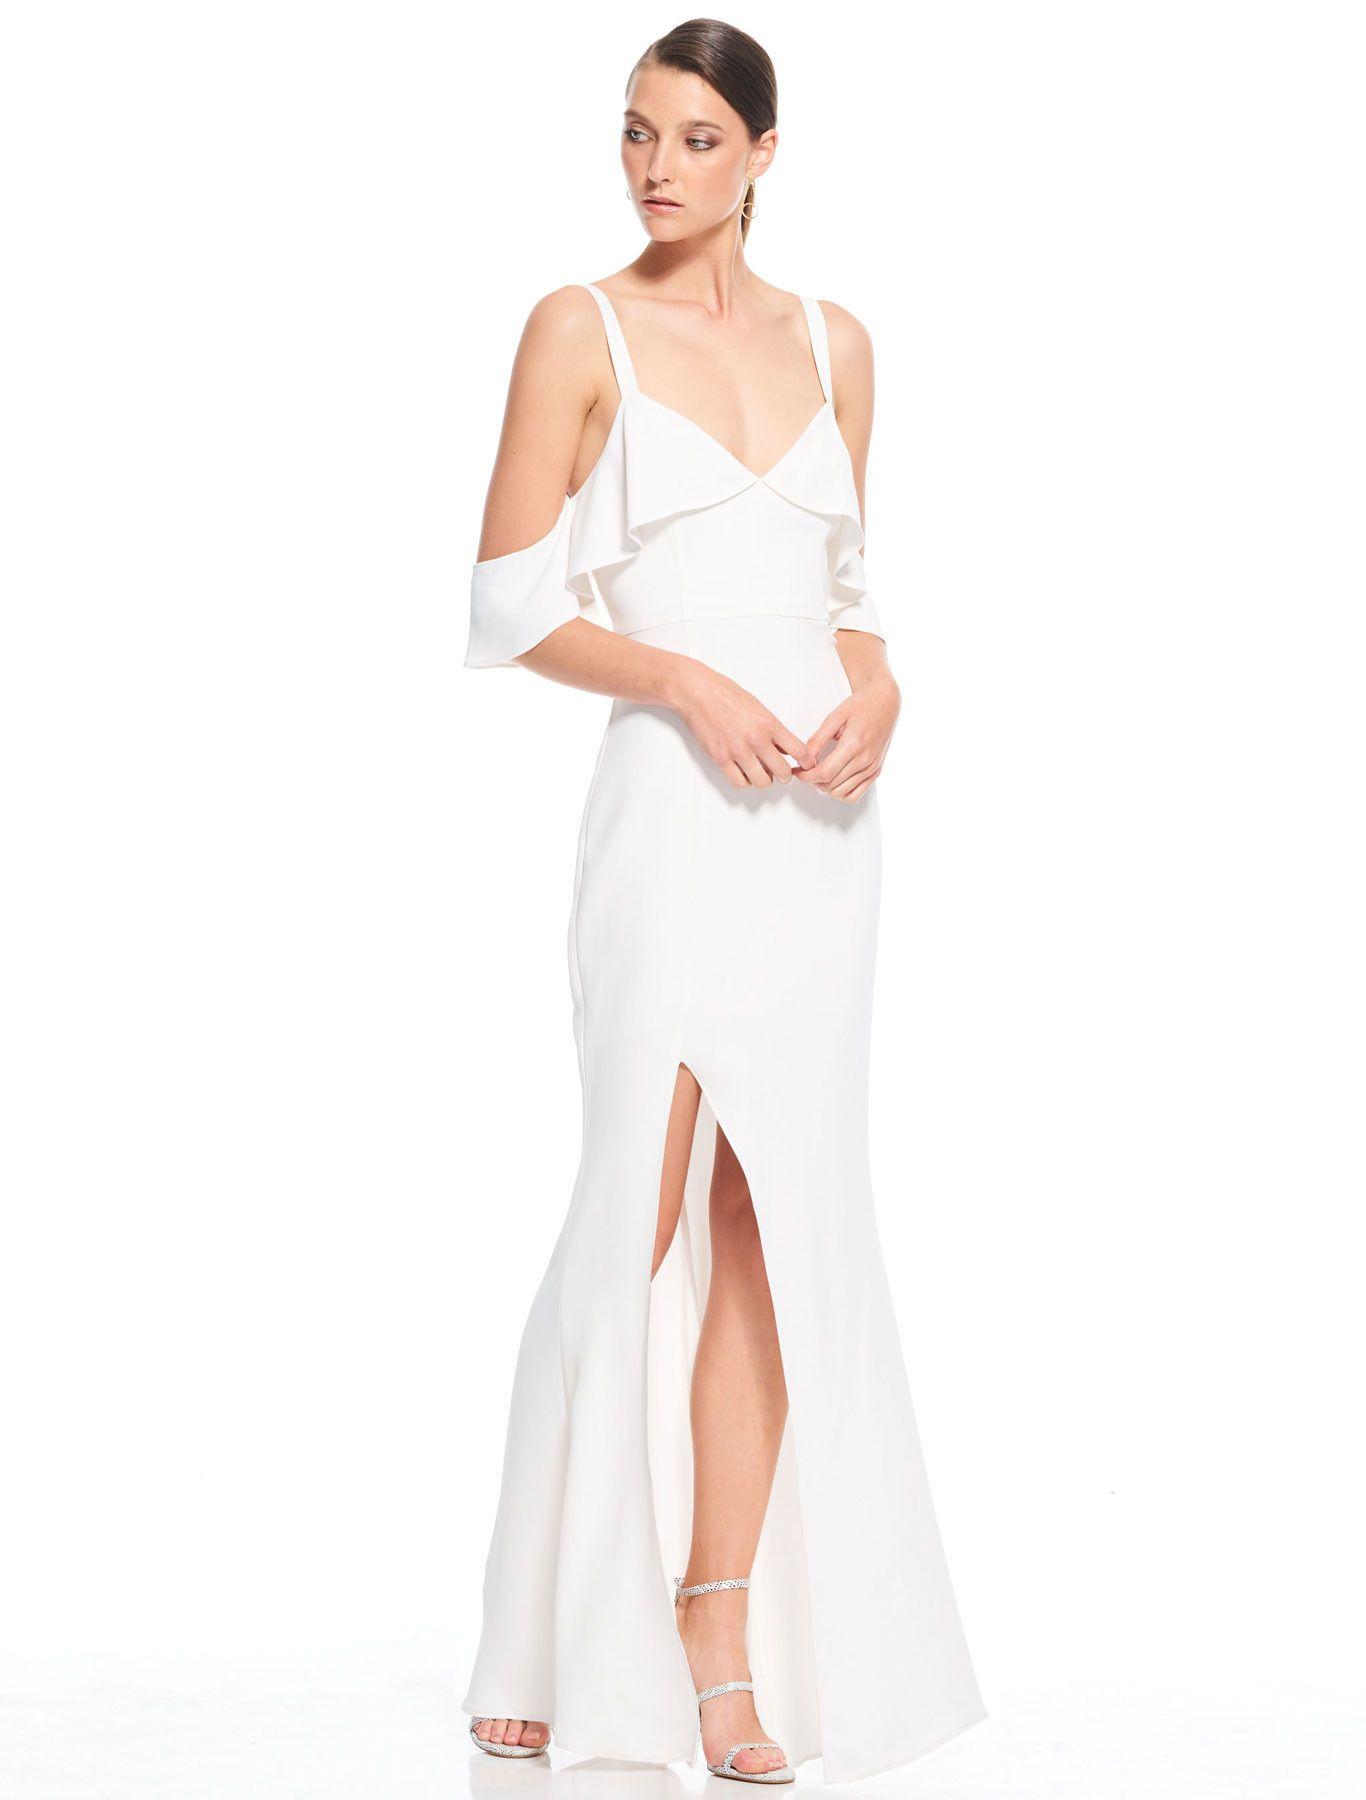 Talulah - Vanity Fair Gown | Wedding dresses | Pinterest | Vanity ...